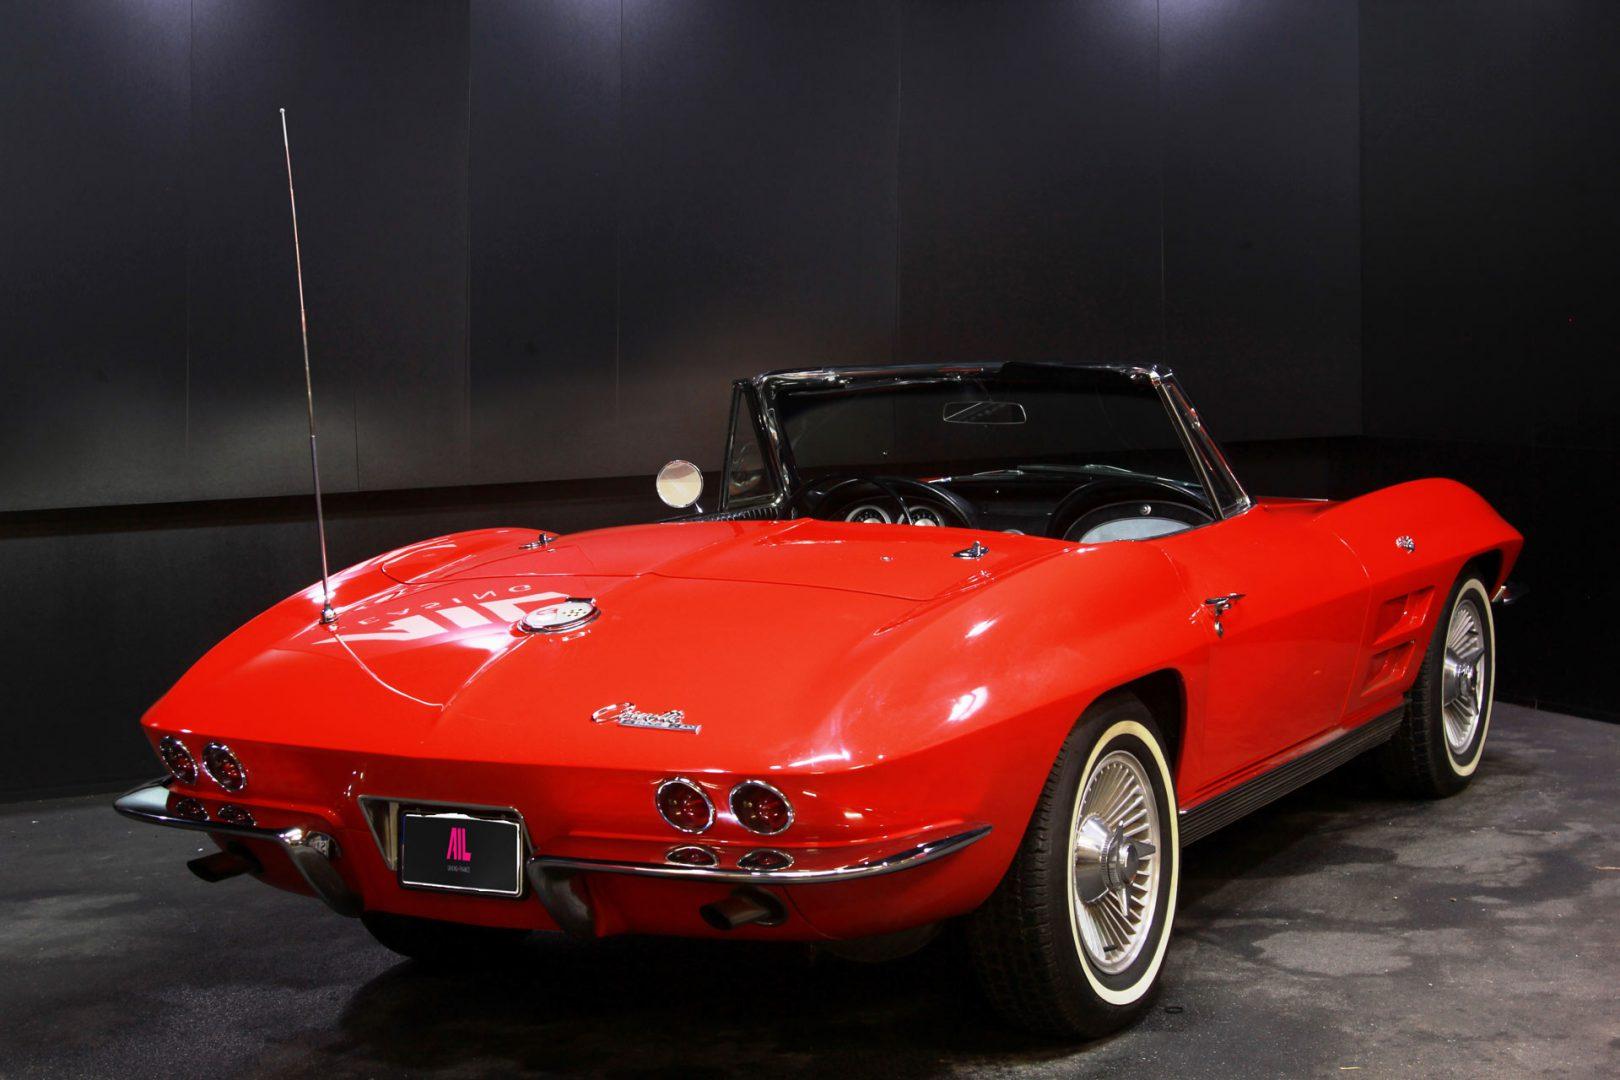 AIL CORVETTE Corvette C2 Cabrio Stingray V8  3